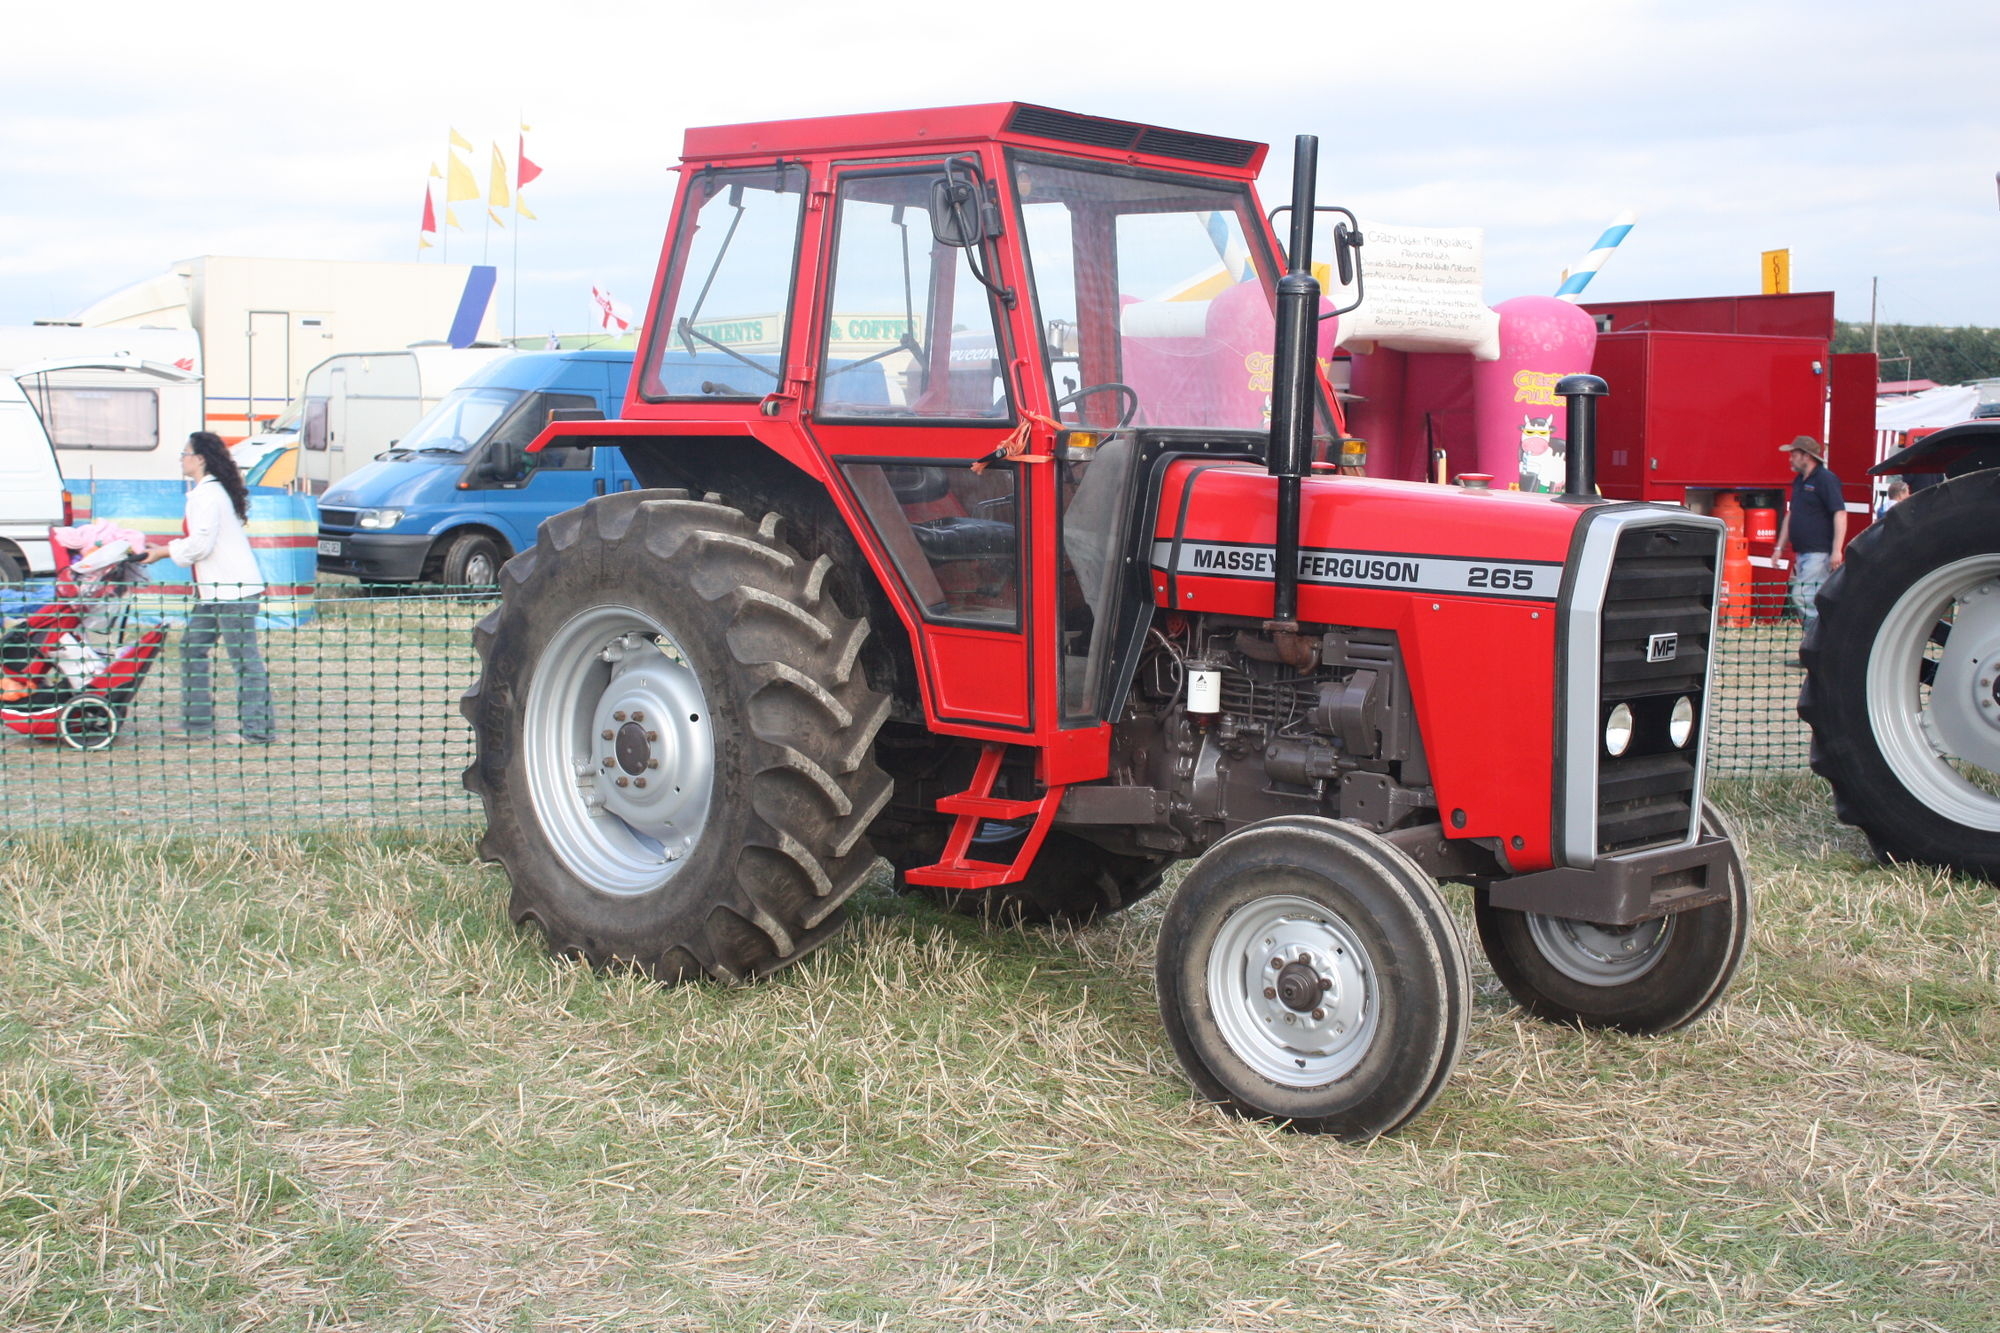 Category:Massey Ferguson 265 | Tractor & Construction Plant Wiki ...